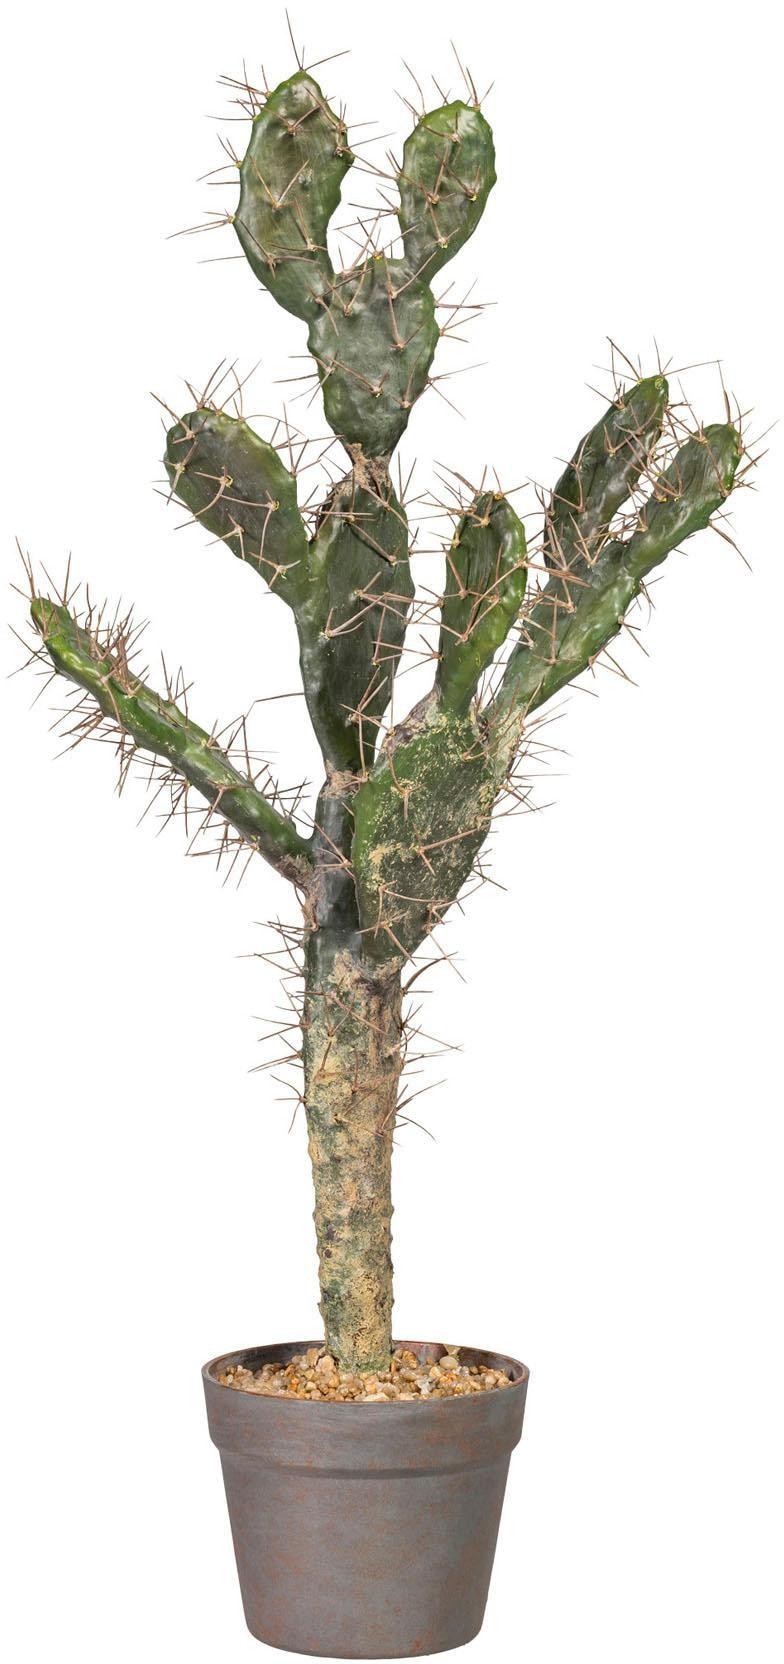 Kunstpflanze Kaktus Opuntie Wohnen/Möbel/Kleinmöbel/Kunstpflanzen/Kunstkakteen